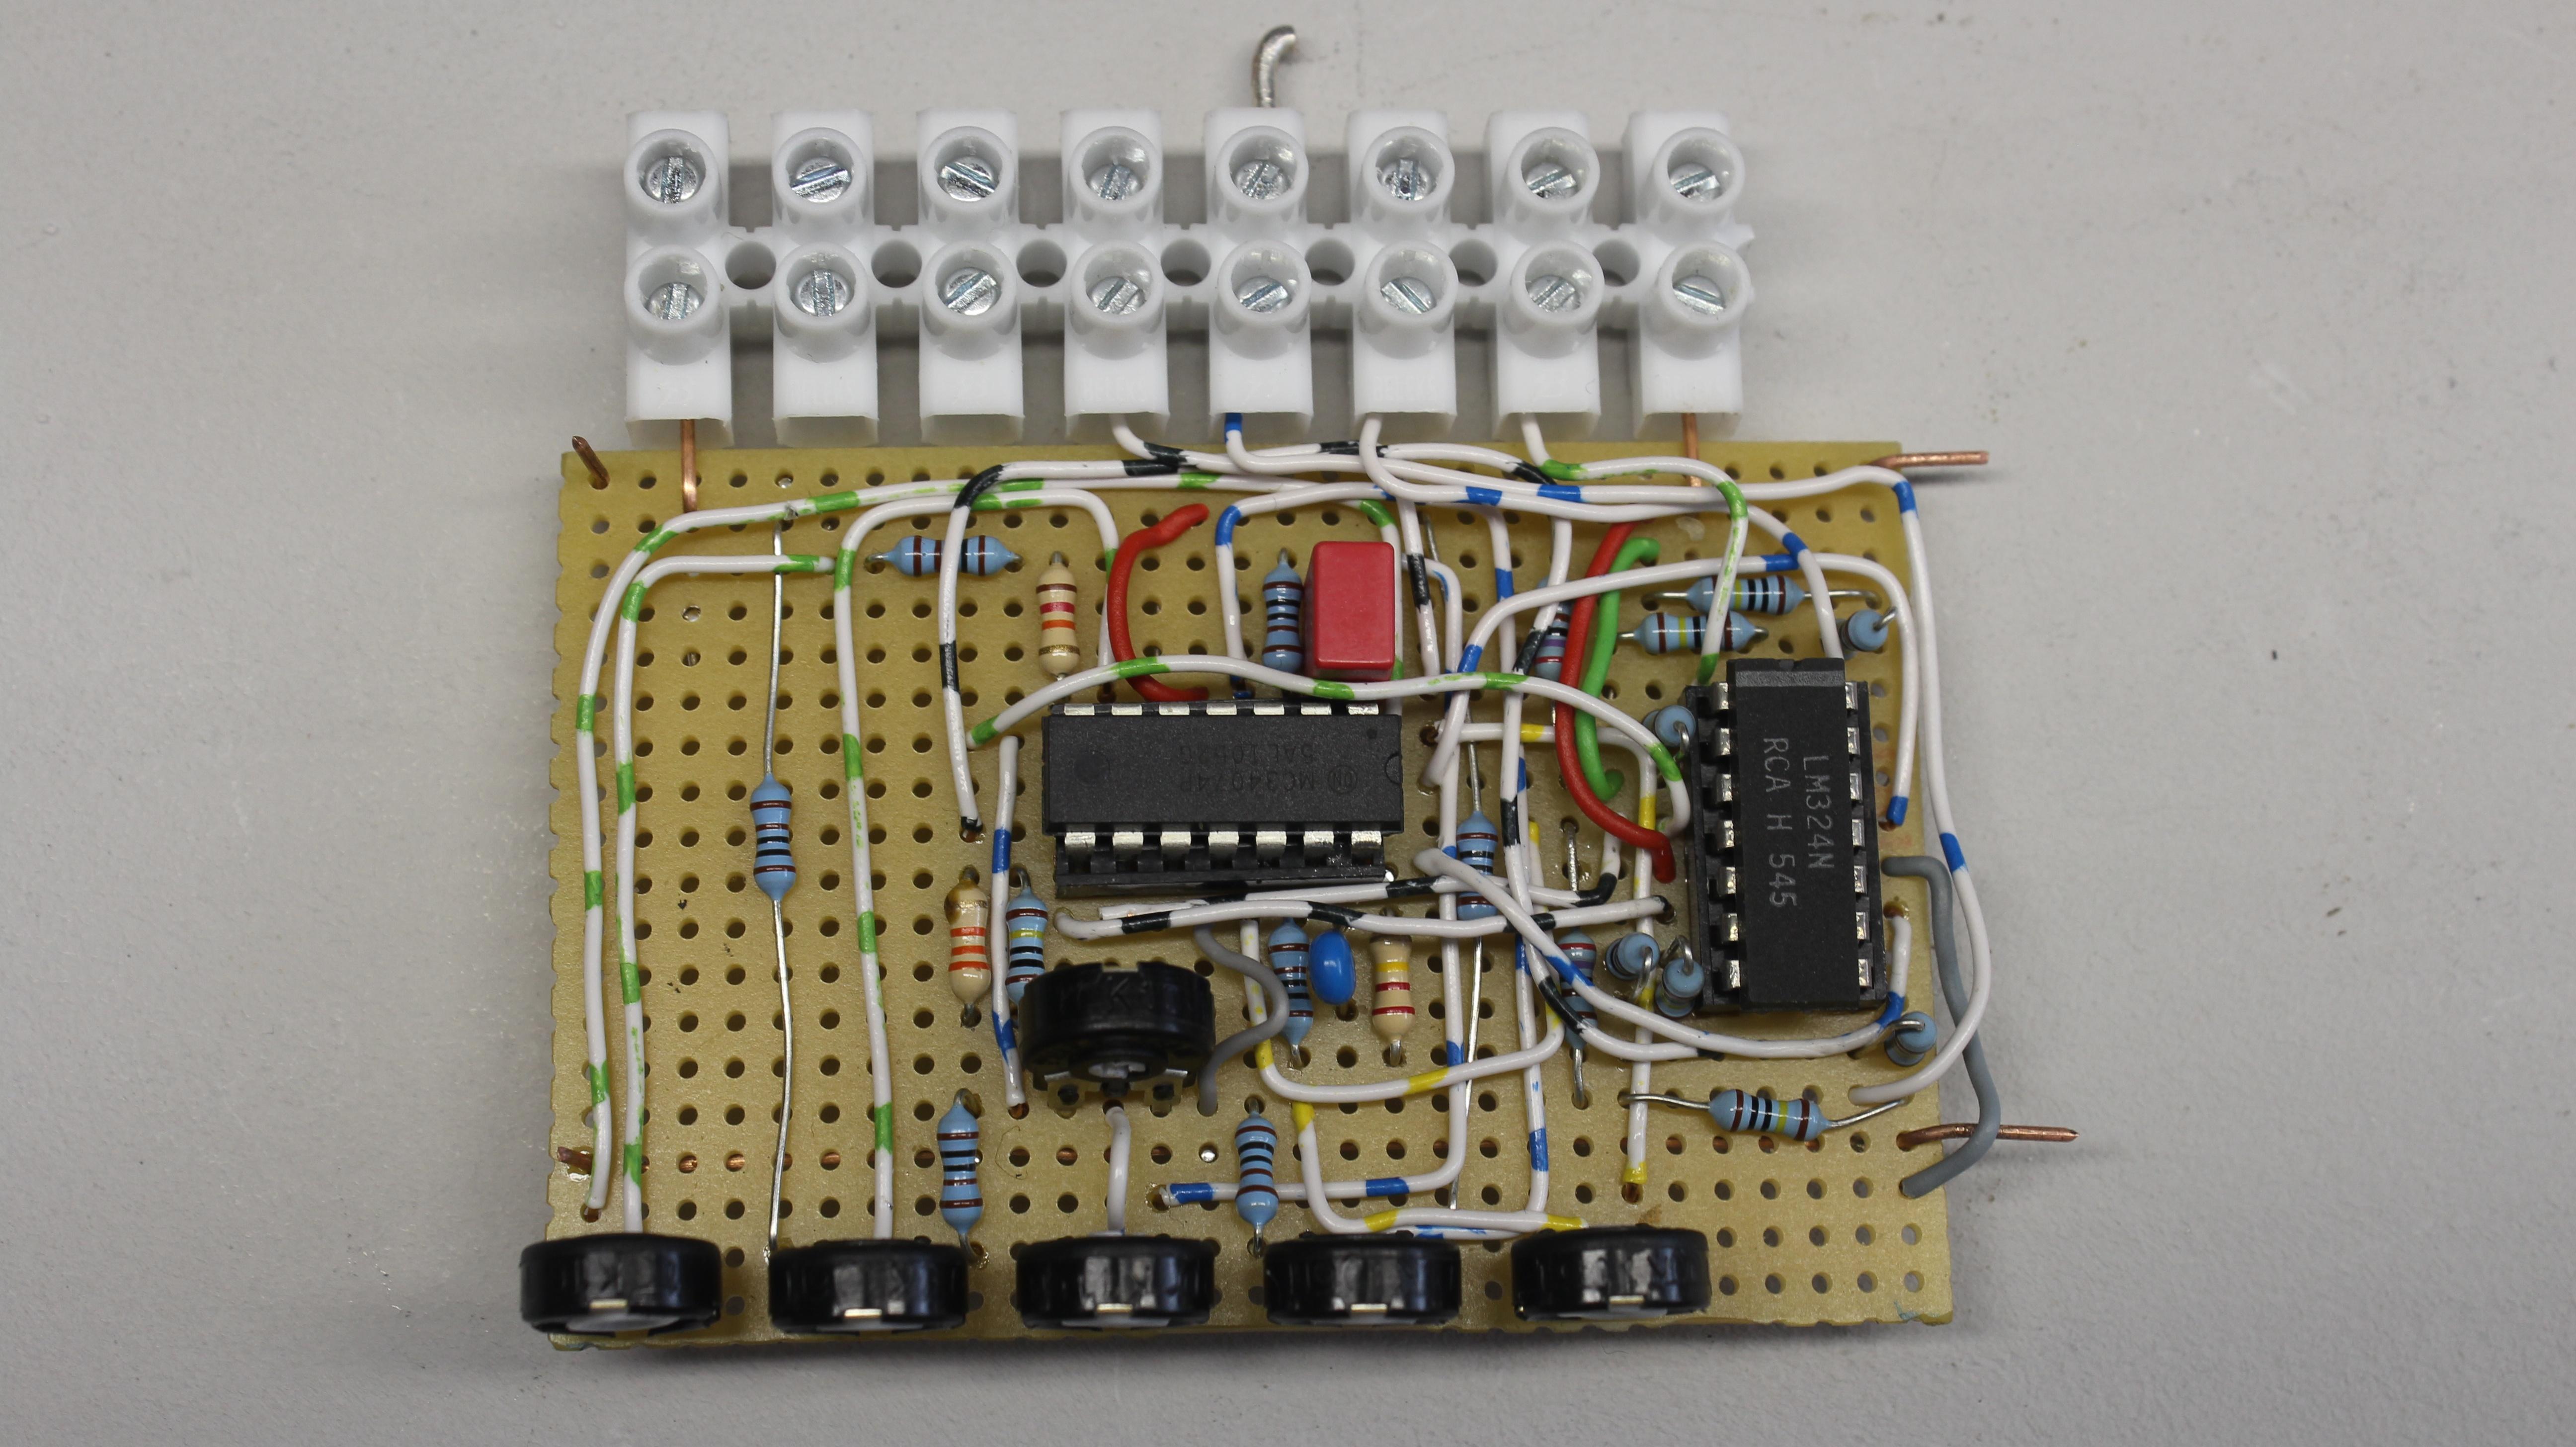 Mikrofon Girisli  lifikatorlu 4 Kanal Mikser as well 1n4732 Zener Diode 1w 4 7v likewise Laboratuar Guc Kaynagi 0 350 Volt 0 400ma Ayarli together with Op  4 likewise Low Noise  lifier For Gps Applications Using Bfp640 Sige Transistor L38174. on op amp circuits